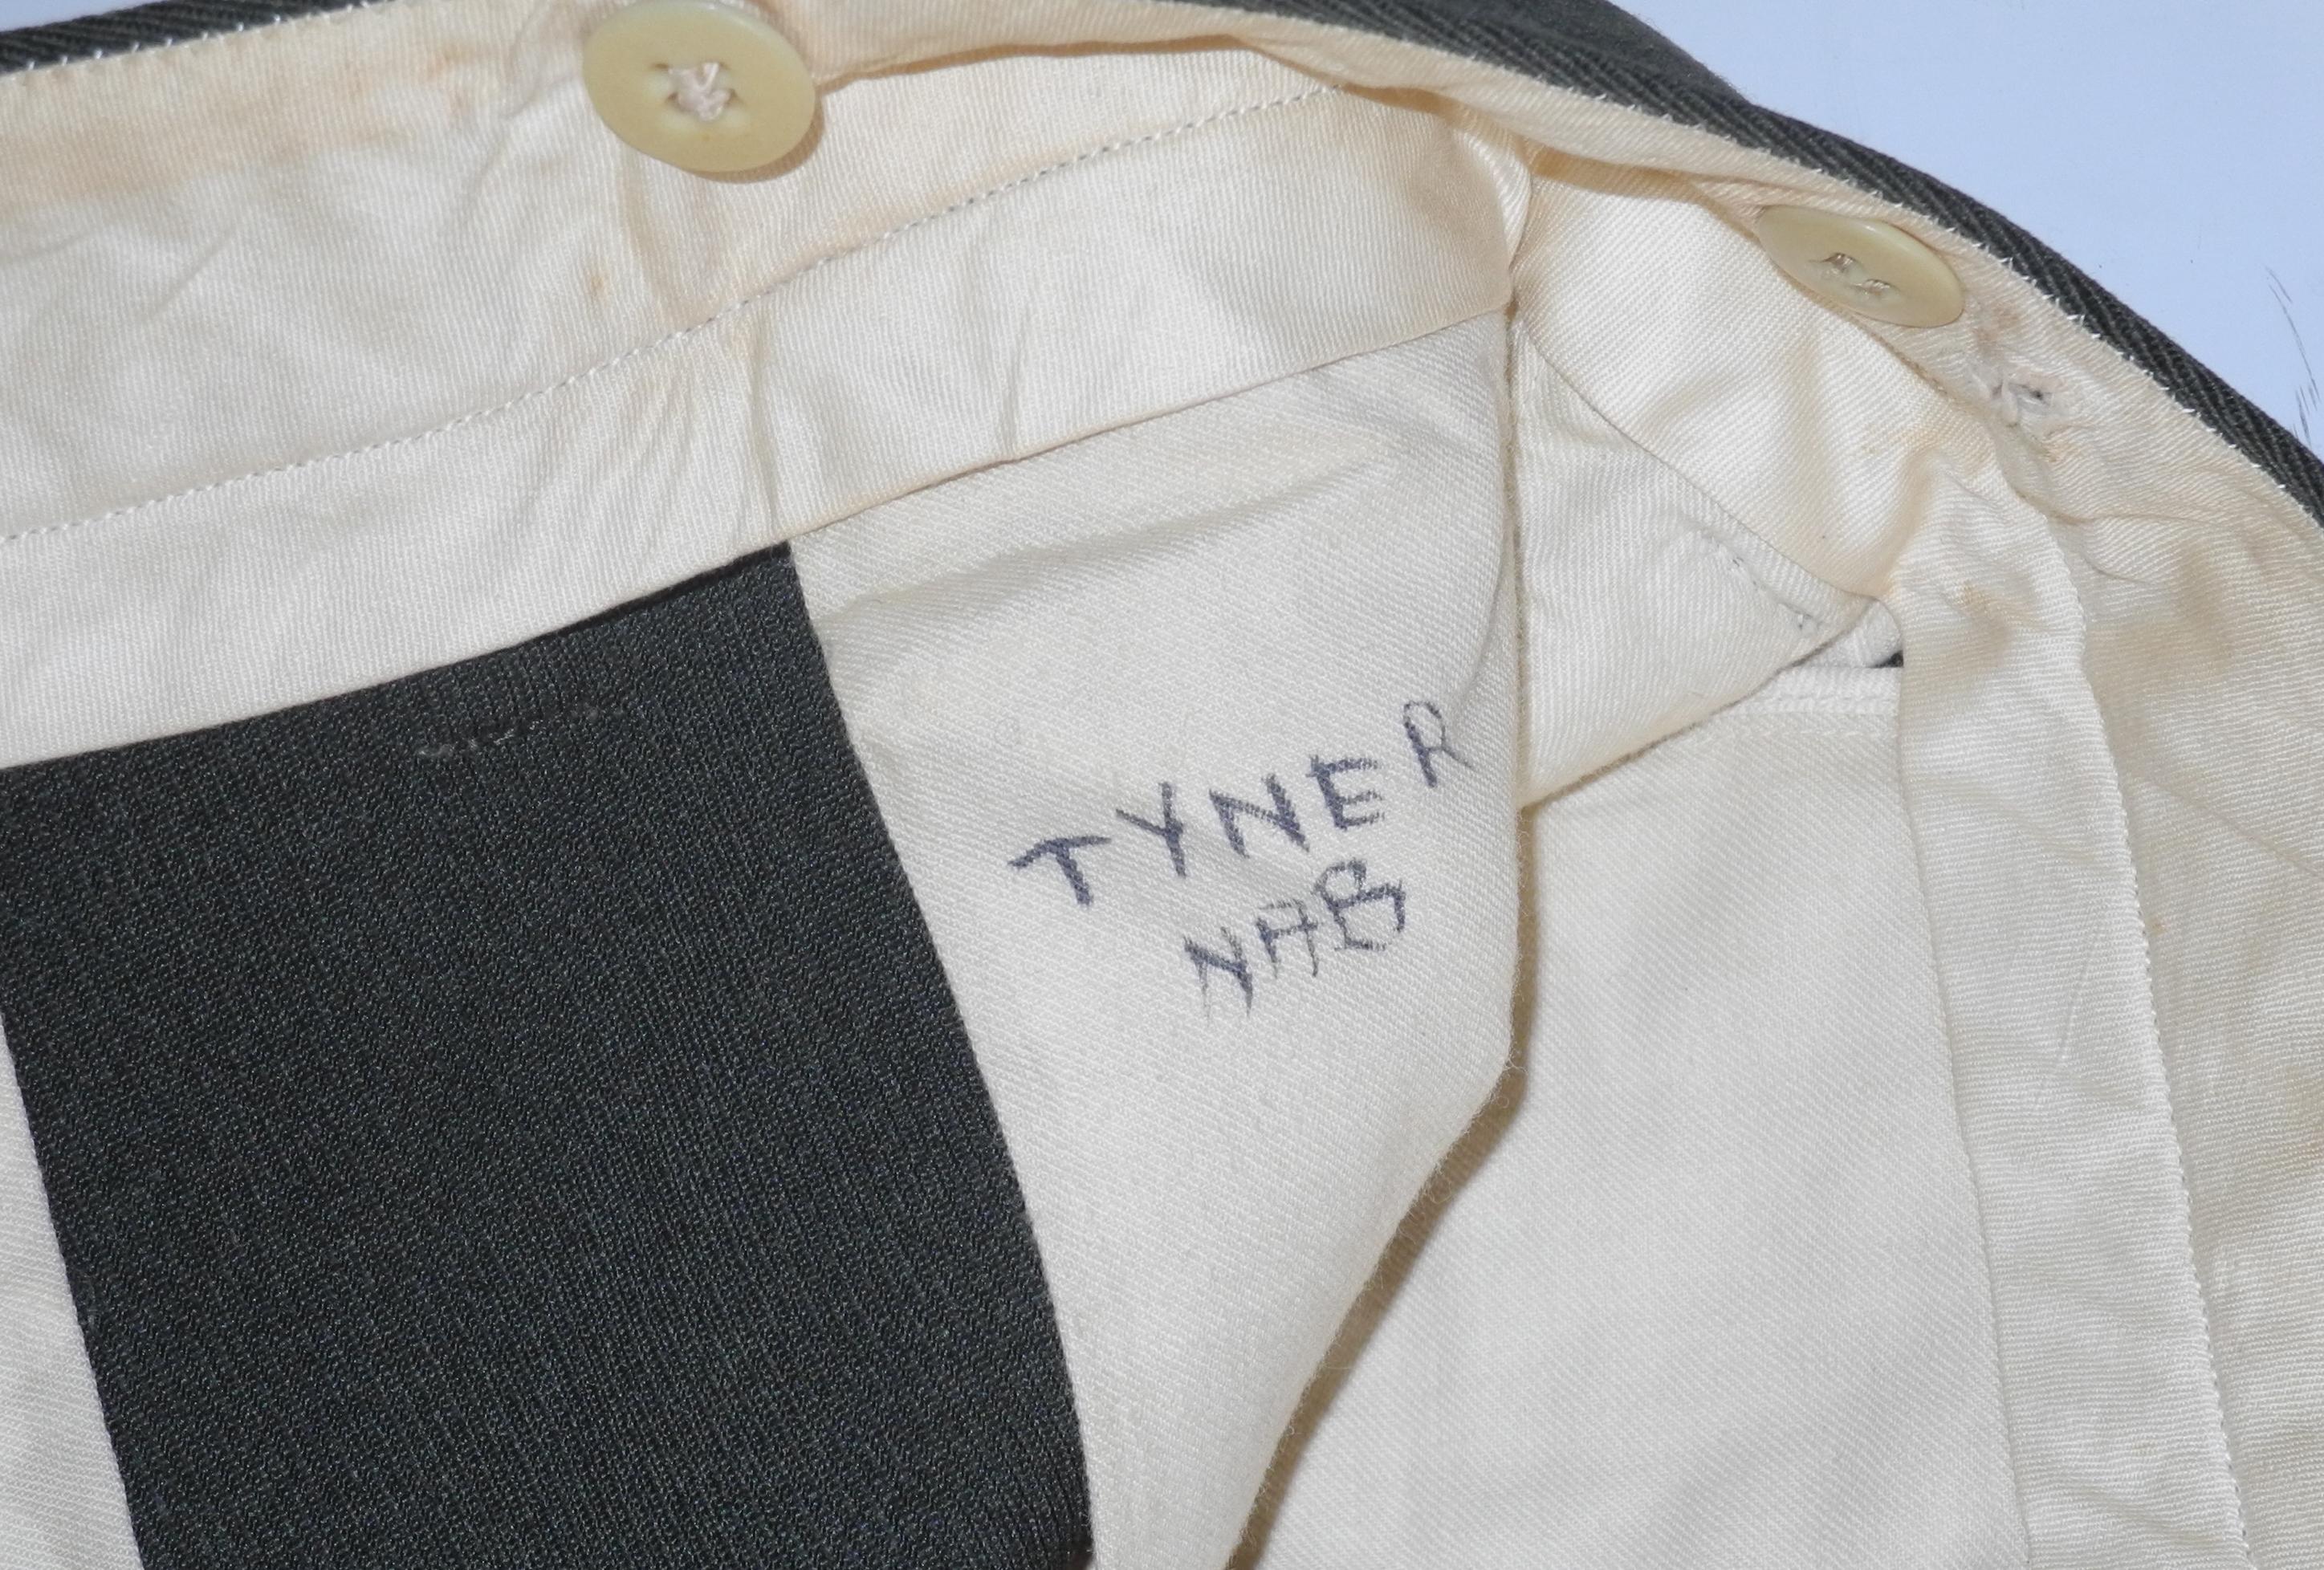 USN Pilot uniform Tyner #1